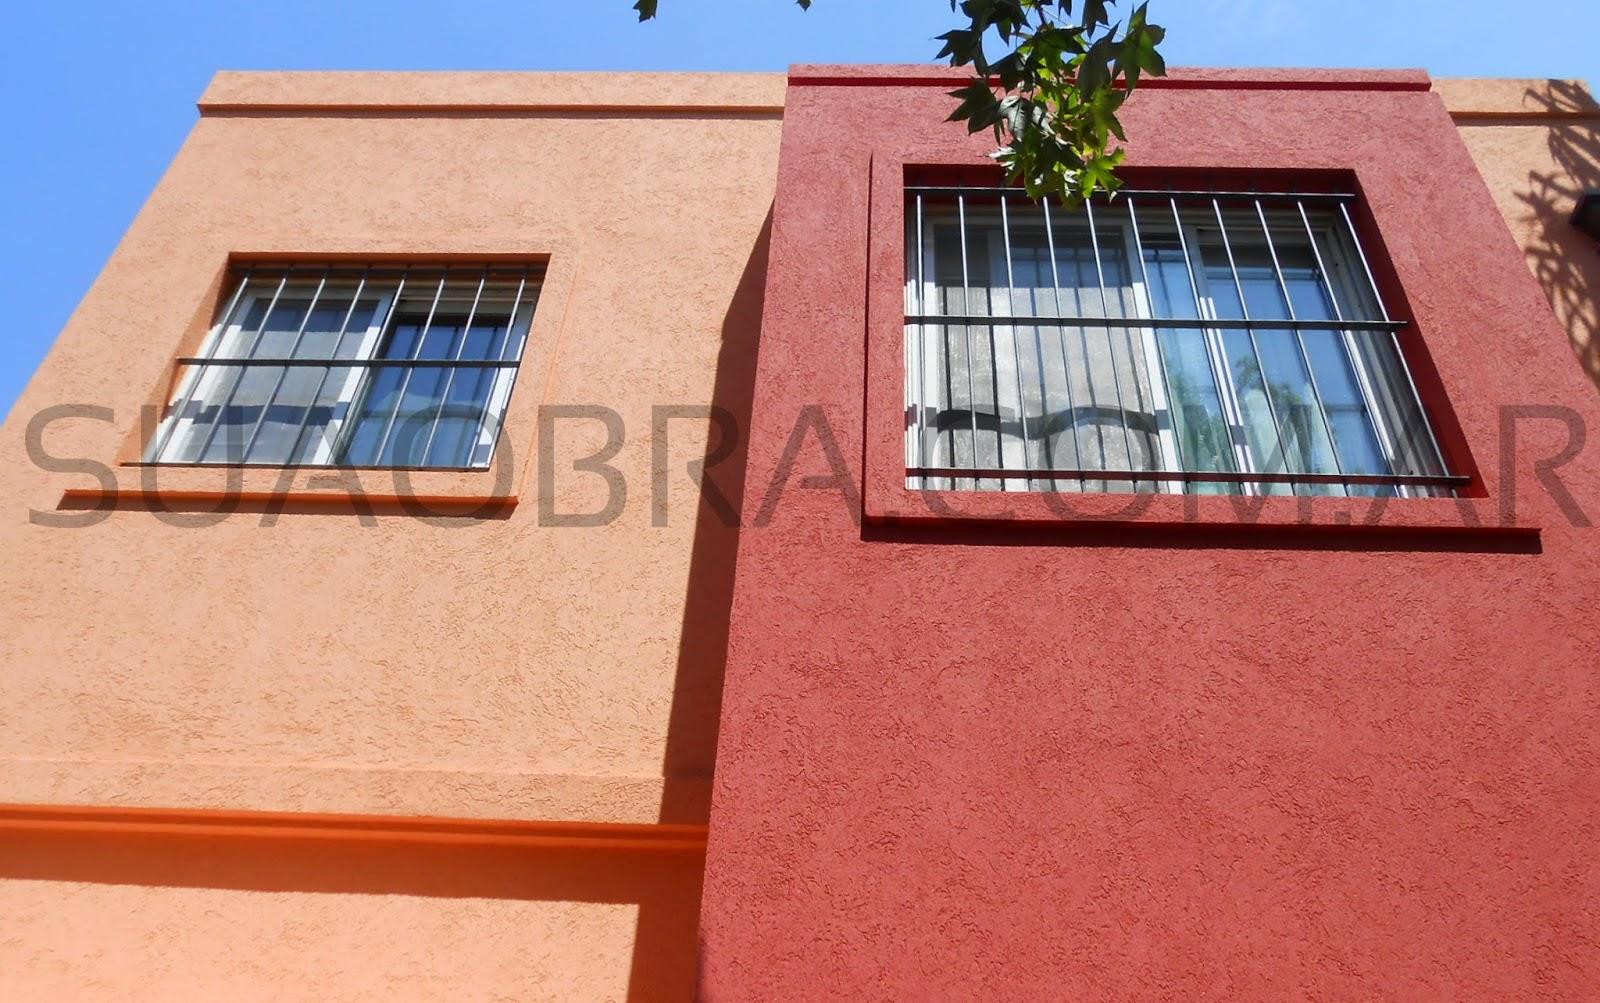 Revoque pl stico exterior de paredes colocaci n - Revestimientos exteriores para casas ...